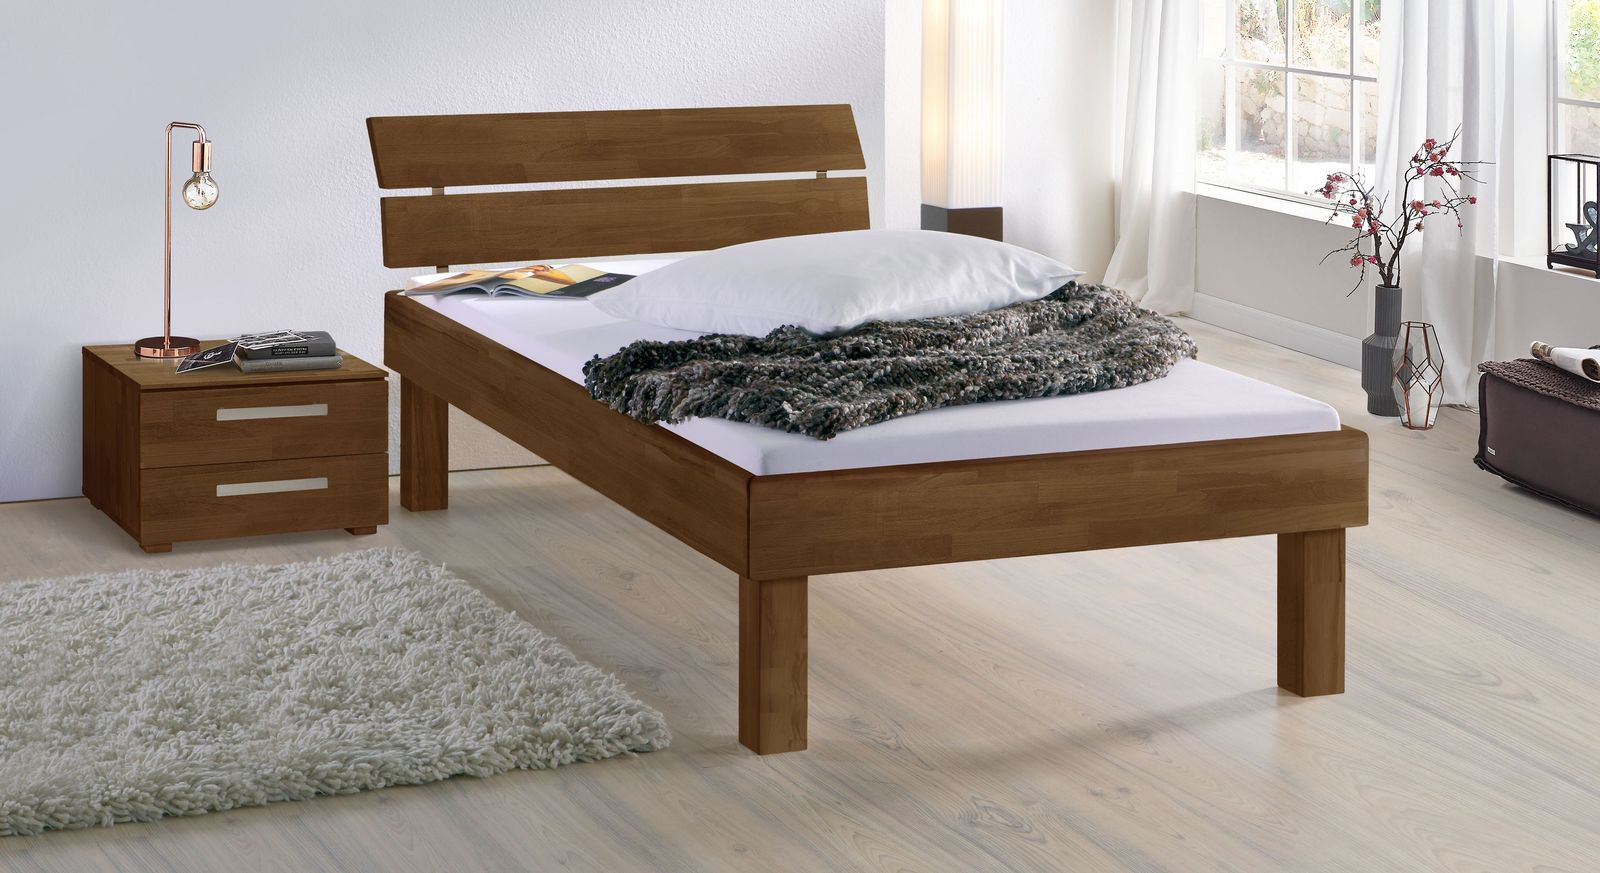 Nussbaumfarbenes Bett Madrid Komfort in 30 cm Höhe